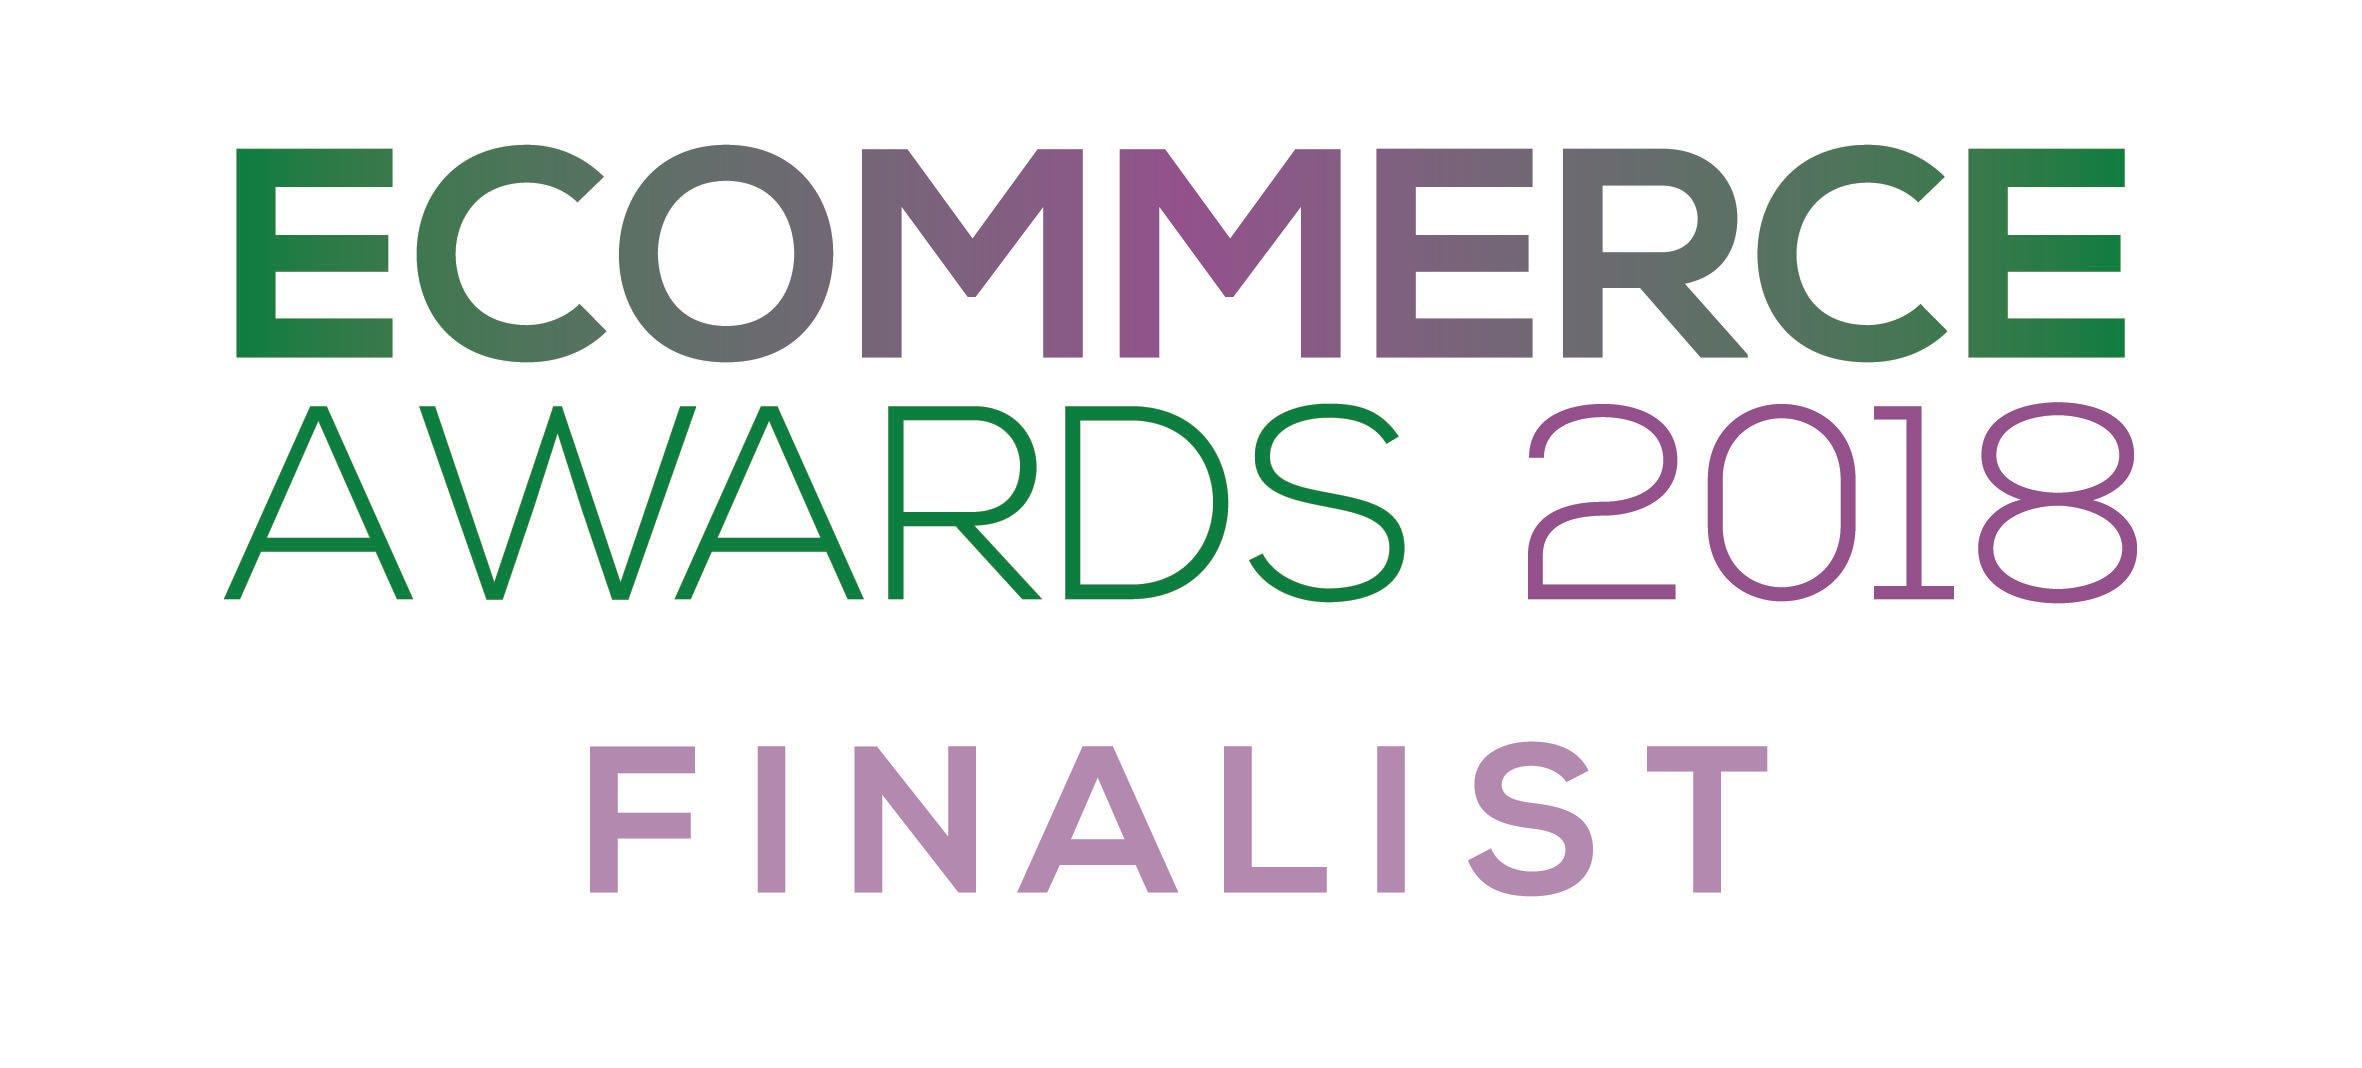 eCommerce Awards FINALIST 2018 Revers.io